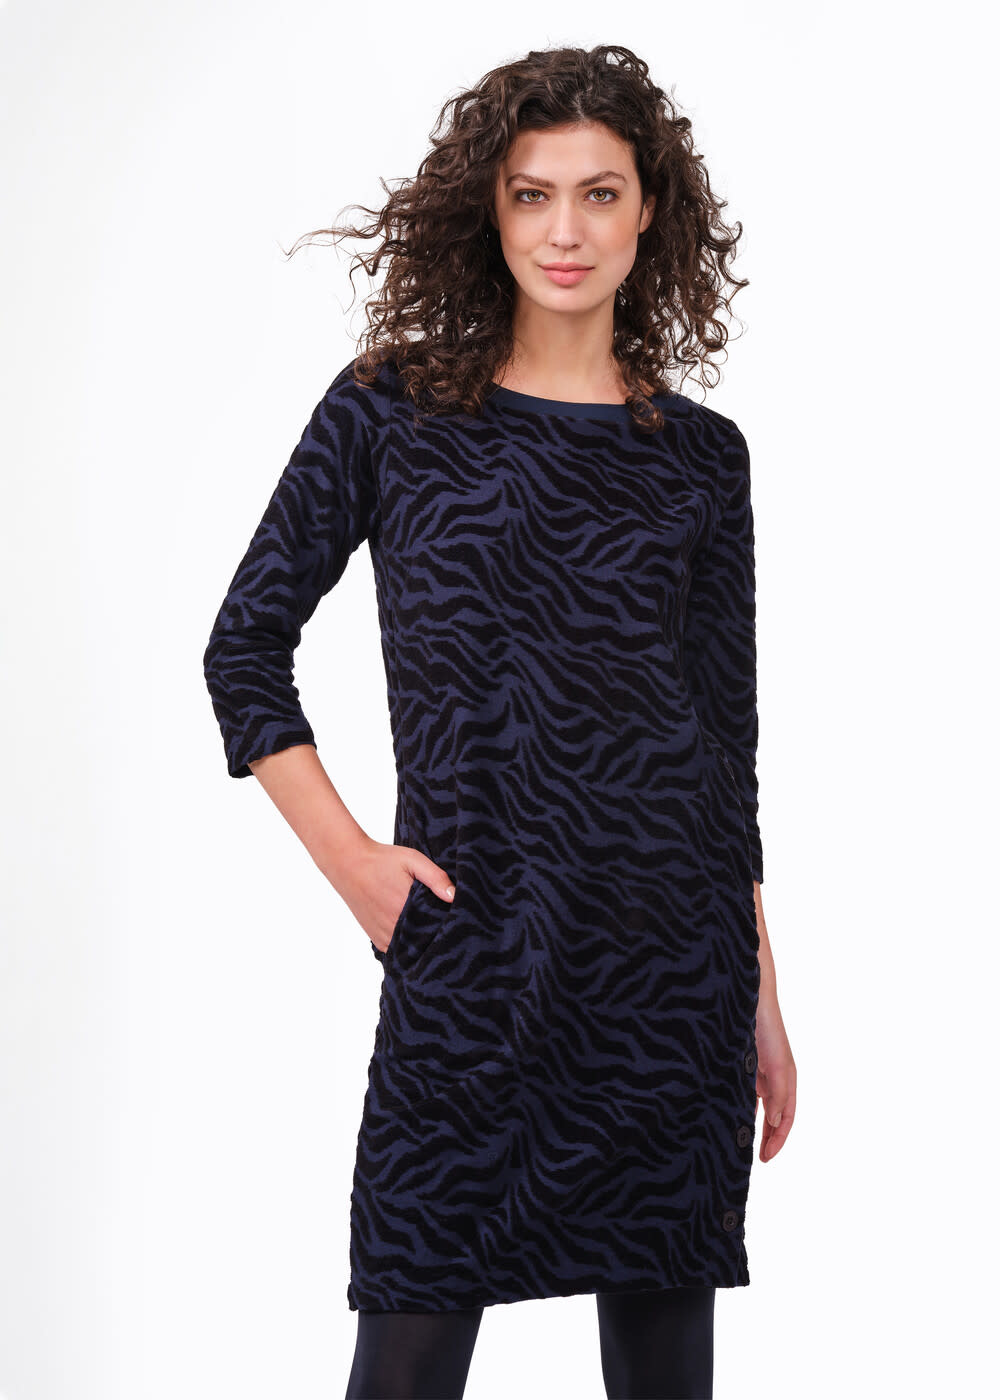 Jacquard Navy and Black Animal Print Dress